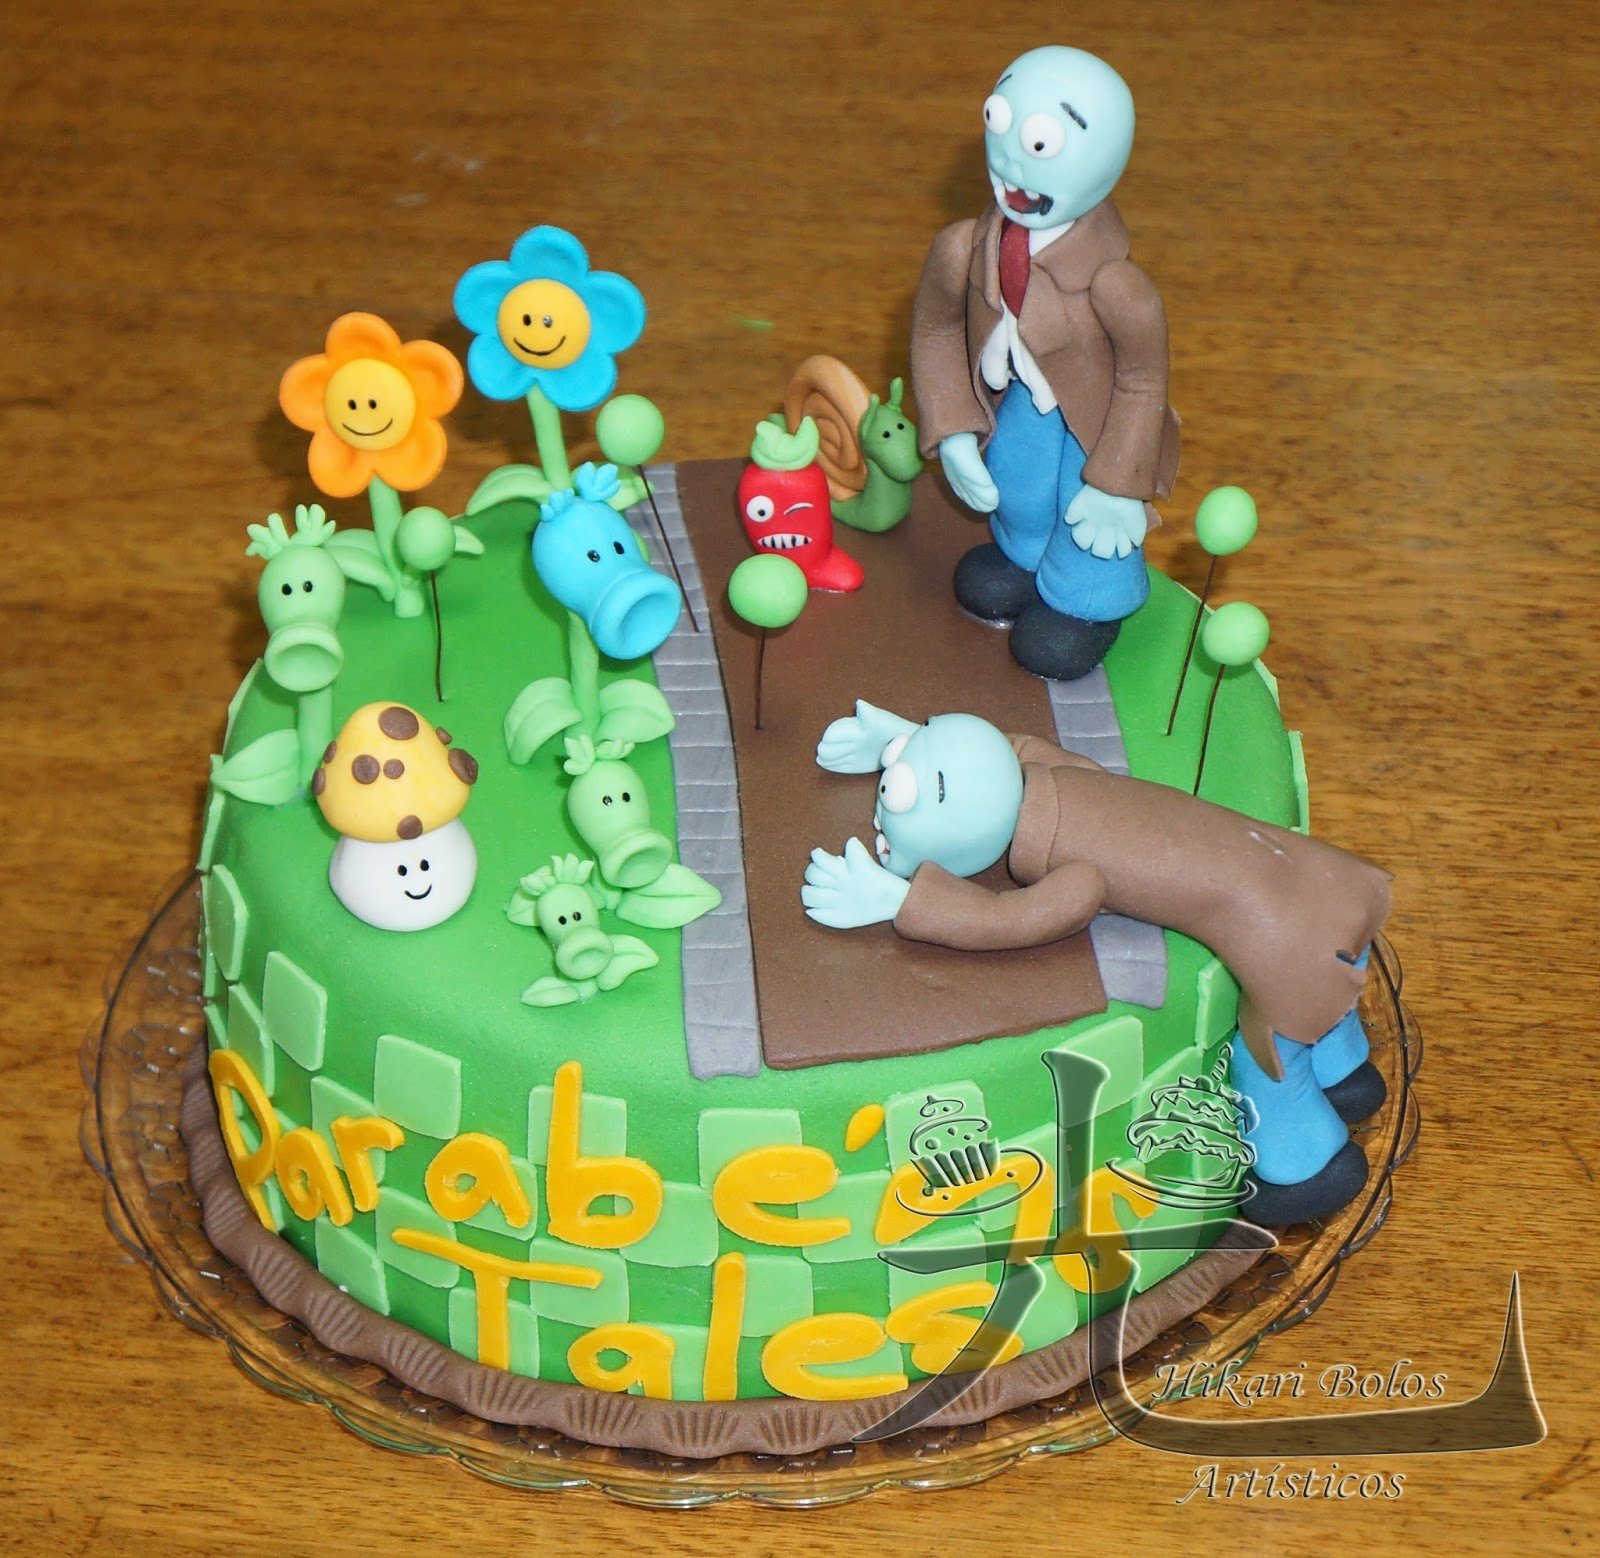 hikari bolos artísticos bolo plantas vs zumbis